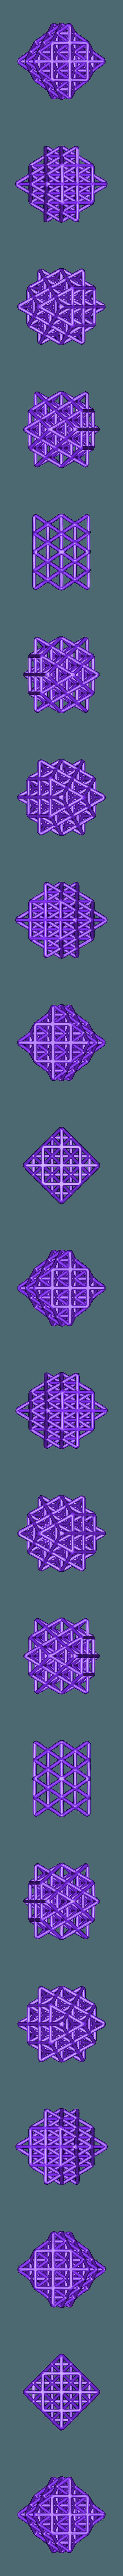 64 tetrahedron complete-FINAL.stl Download STL file 64 Tetrahedron Grid • 3D printing template, VertexMachine